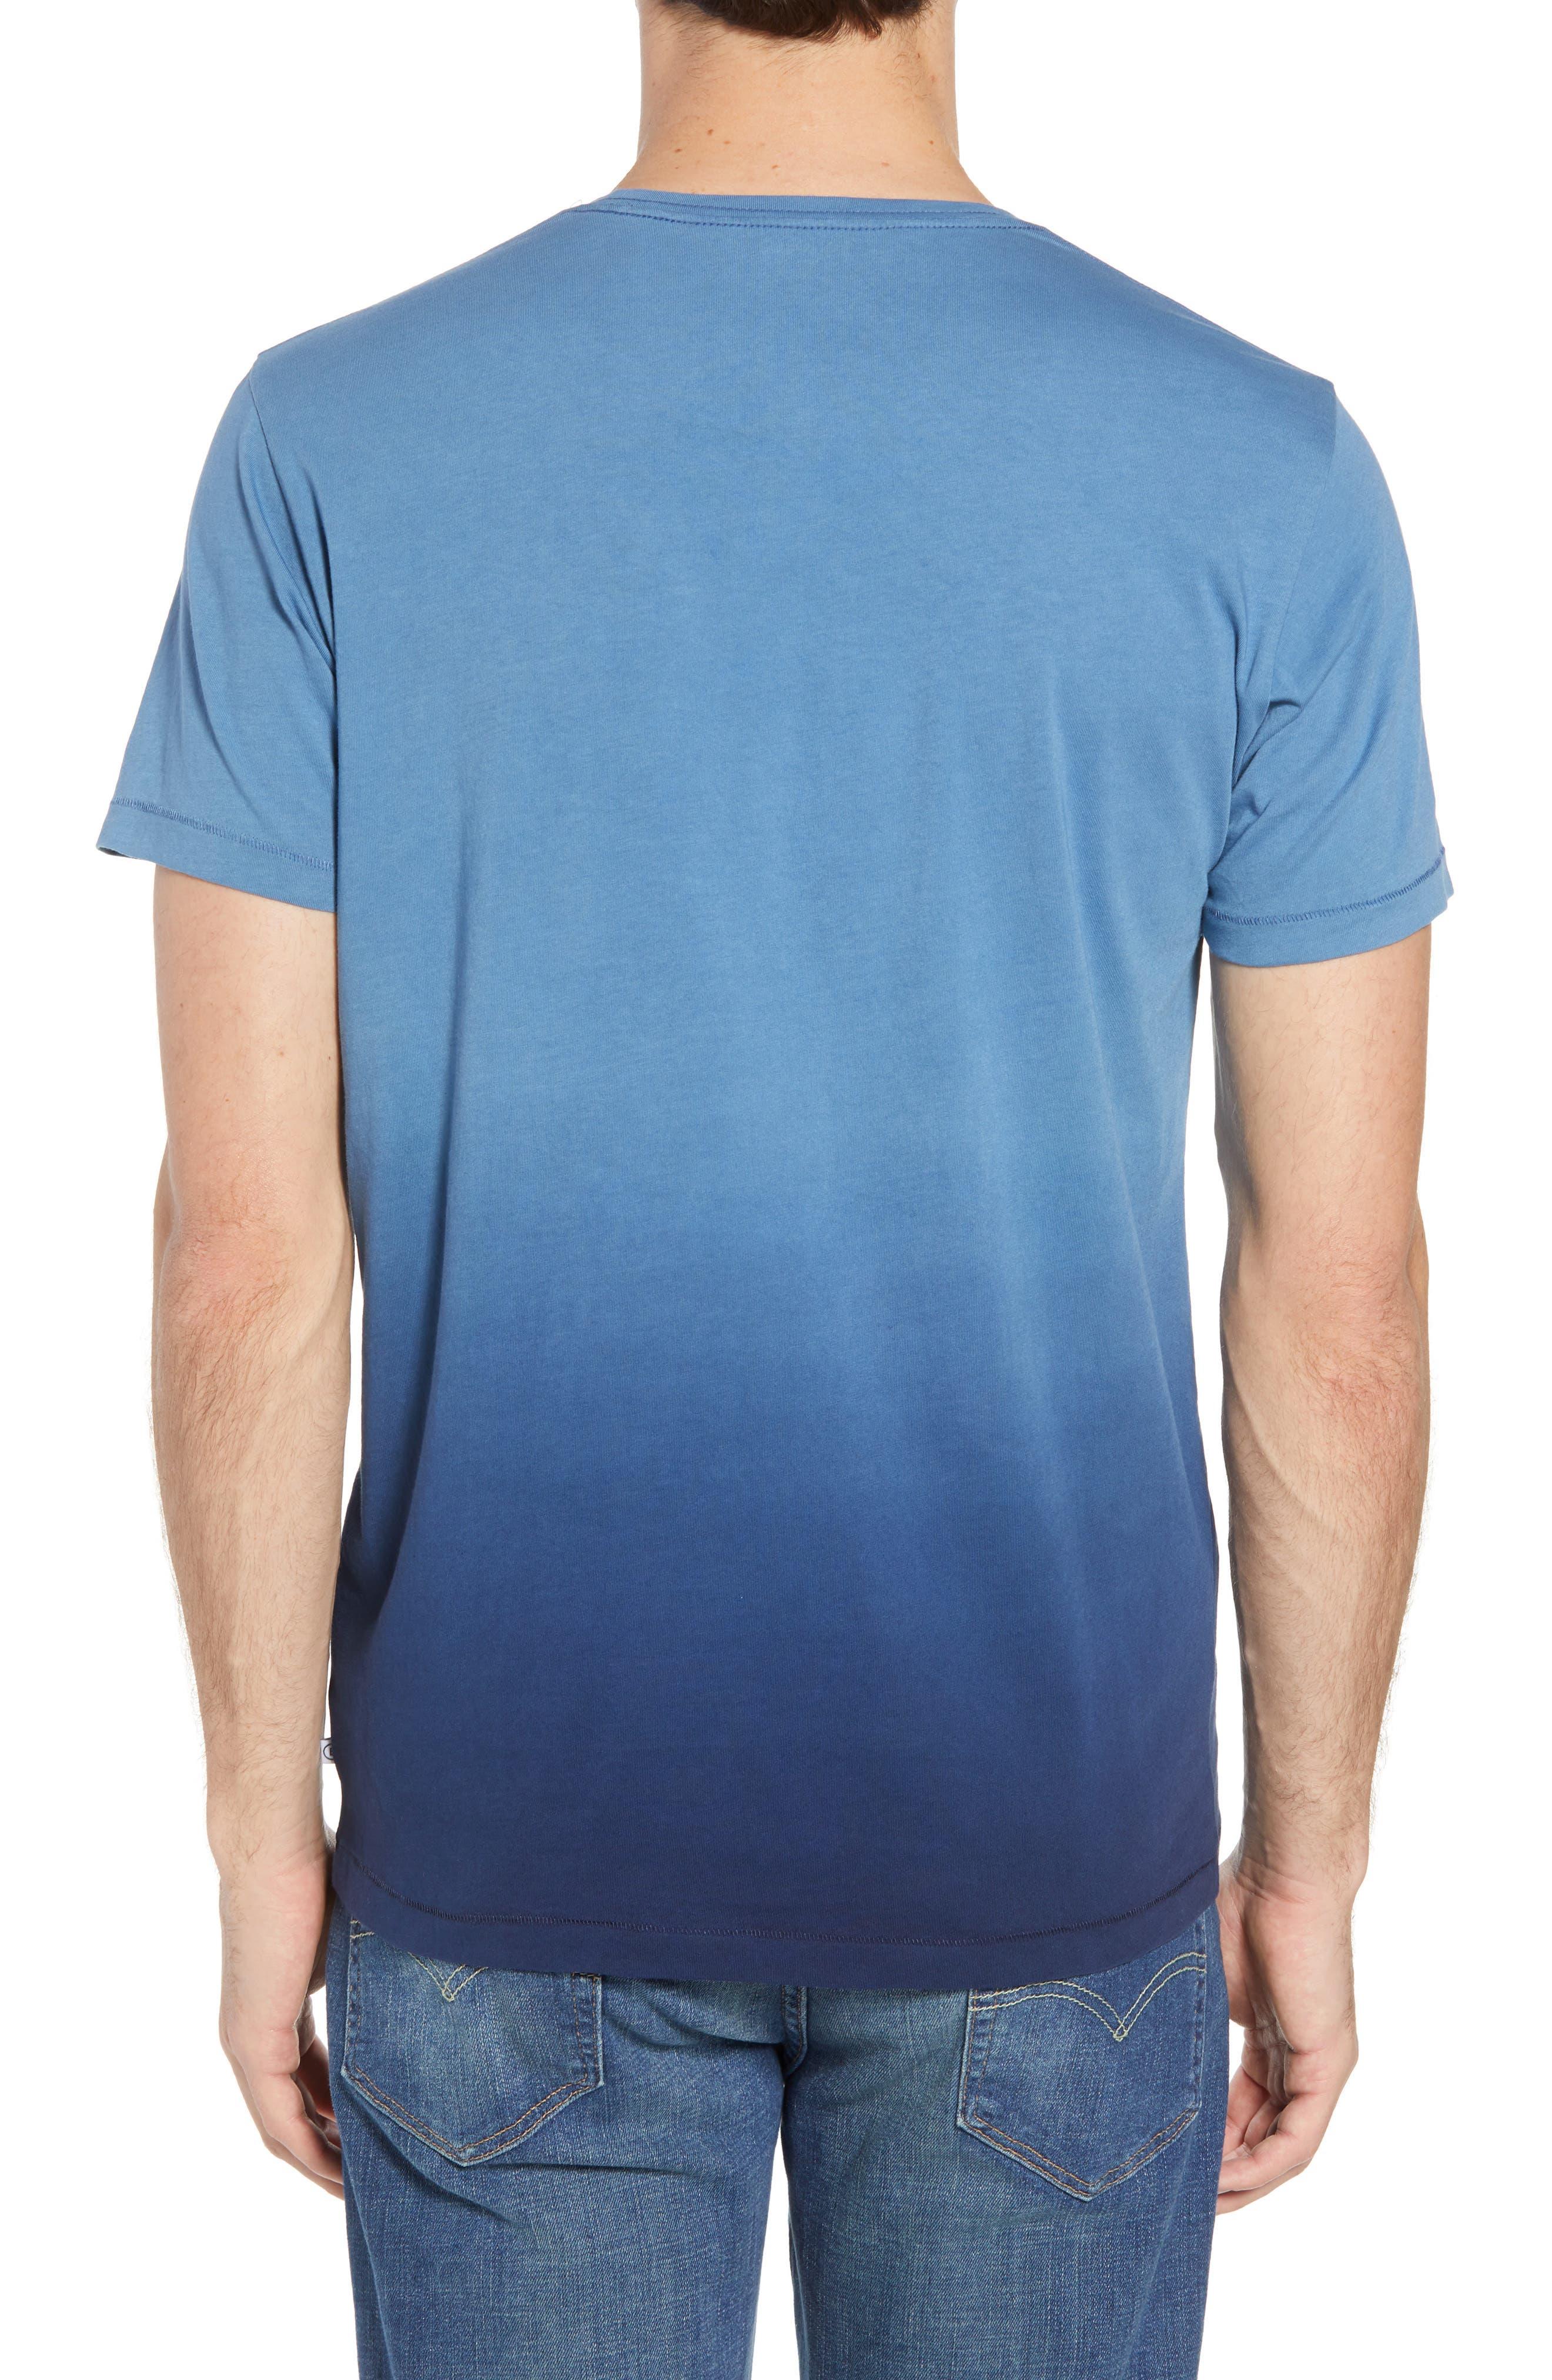 Dip Dye T-Shirt,                             Alternate thumbnail 2, color,                             Navy Ombre